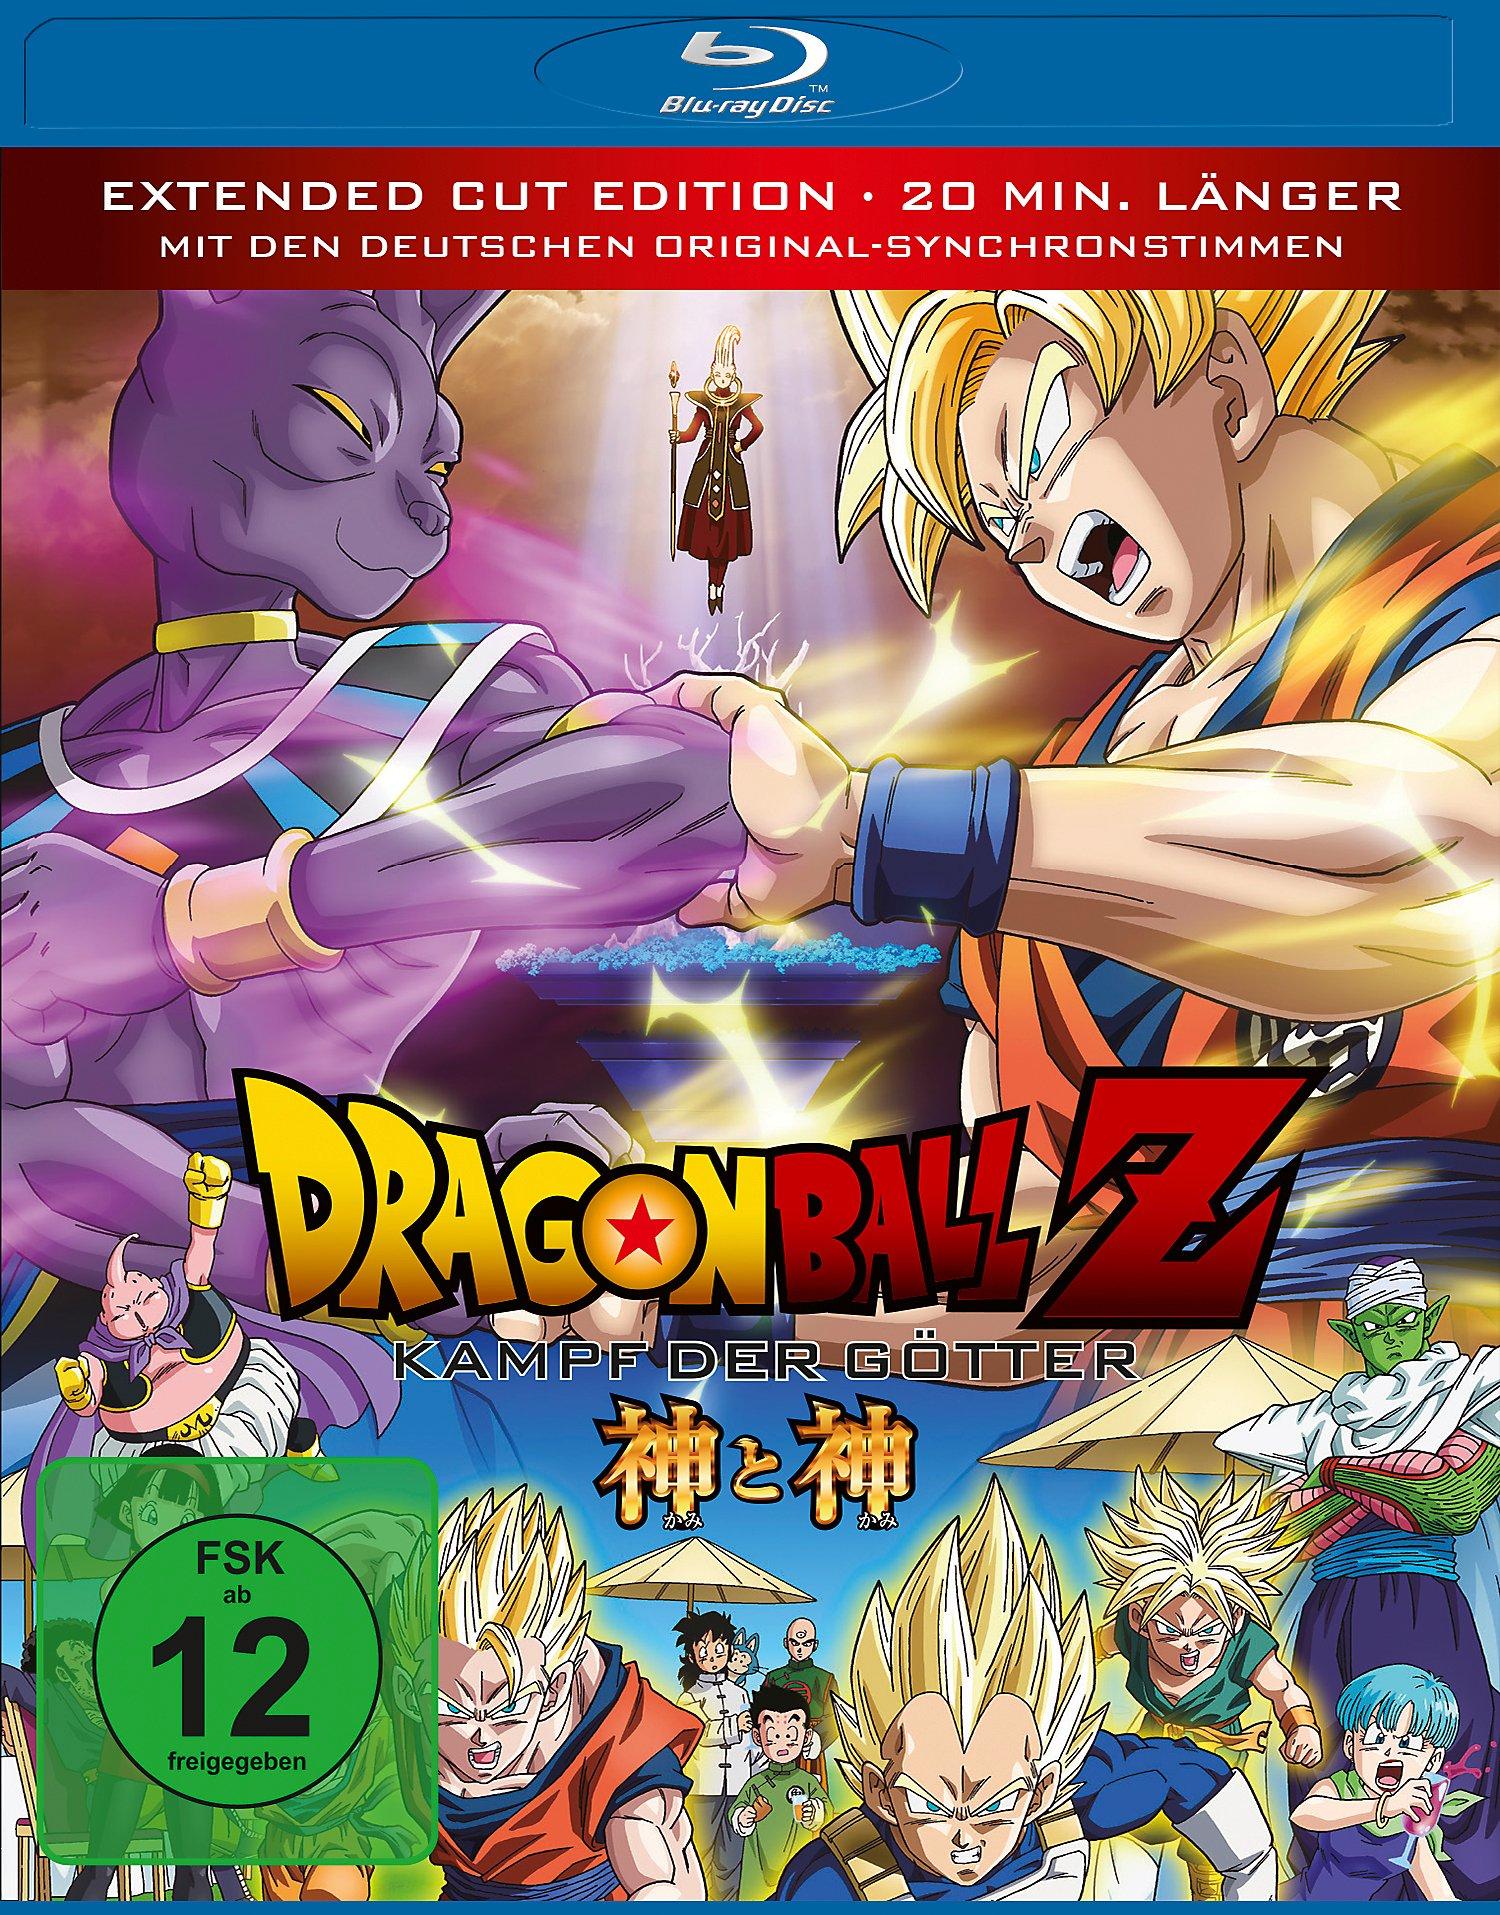 Dragonball Z Kampf Der Götter Download